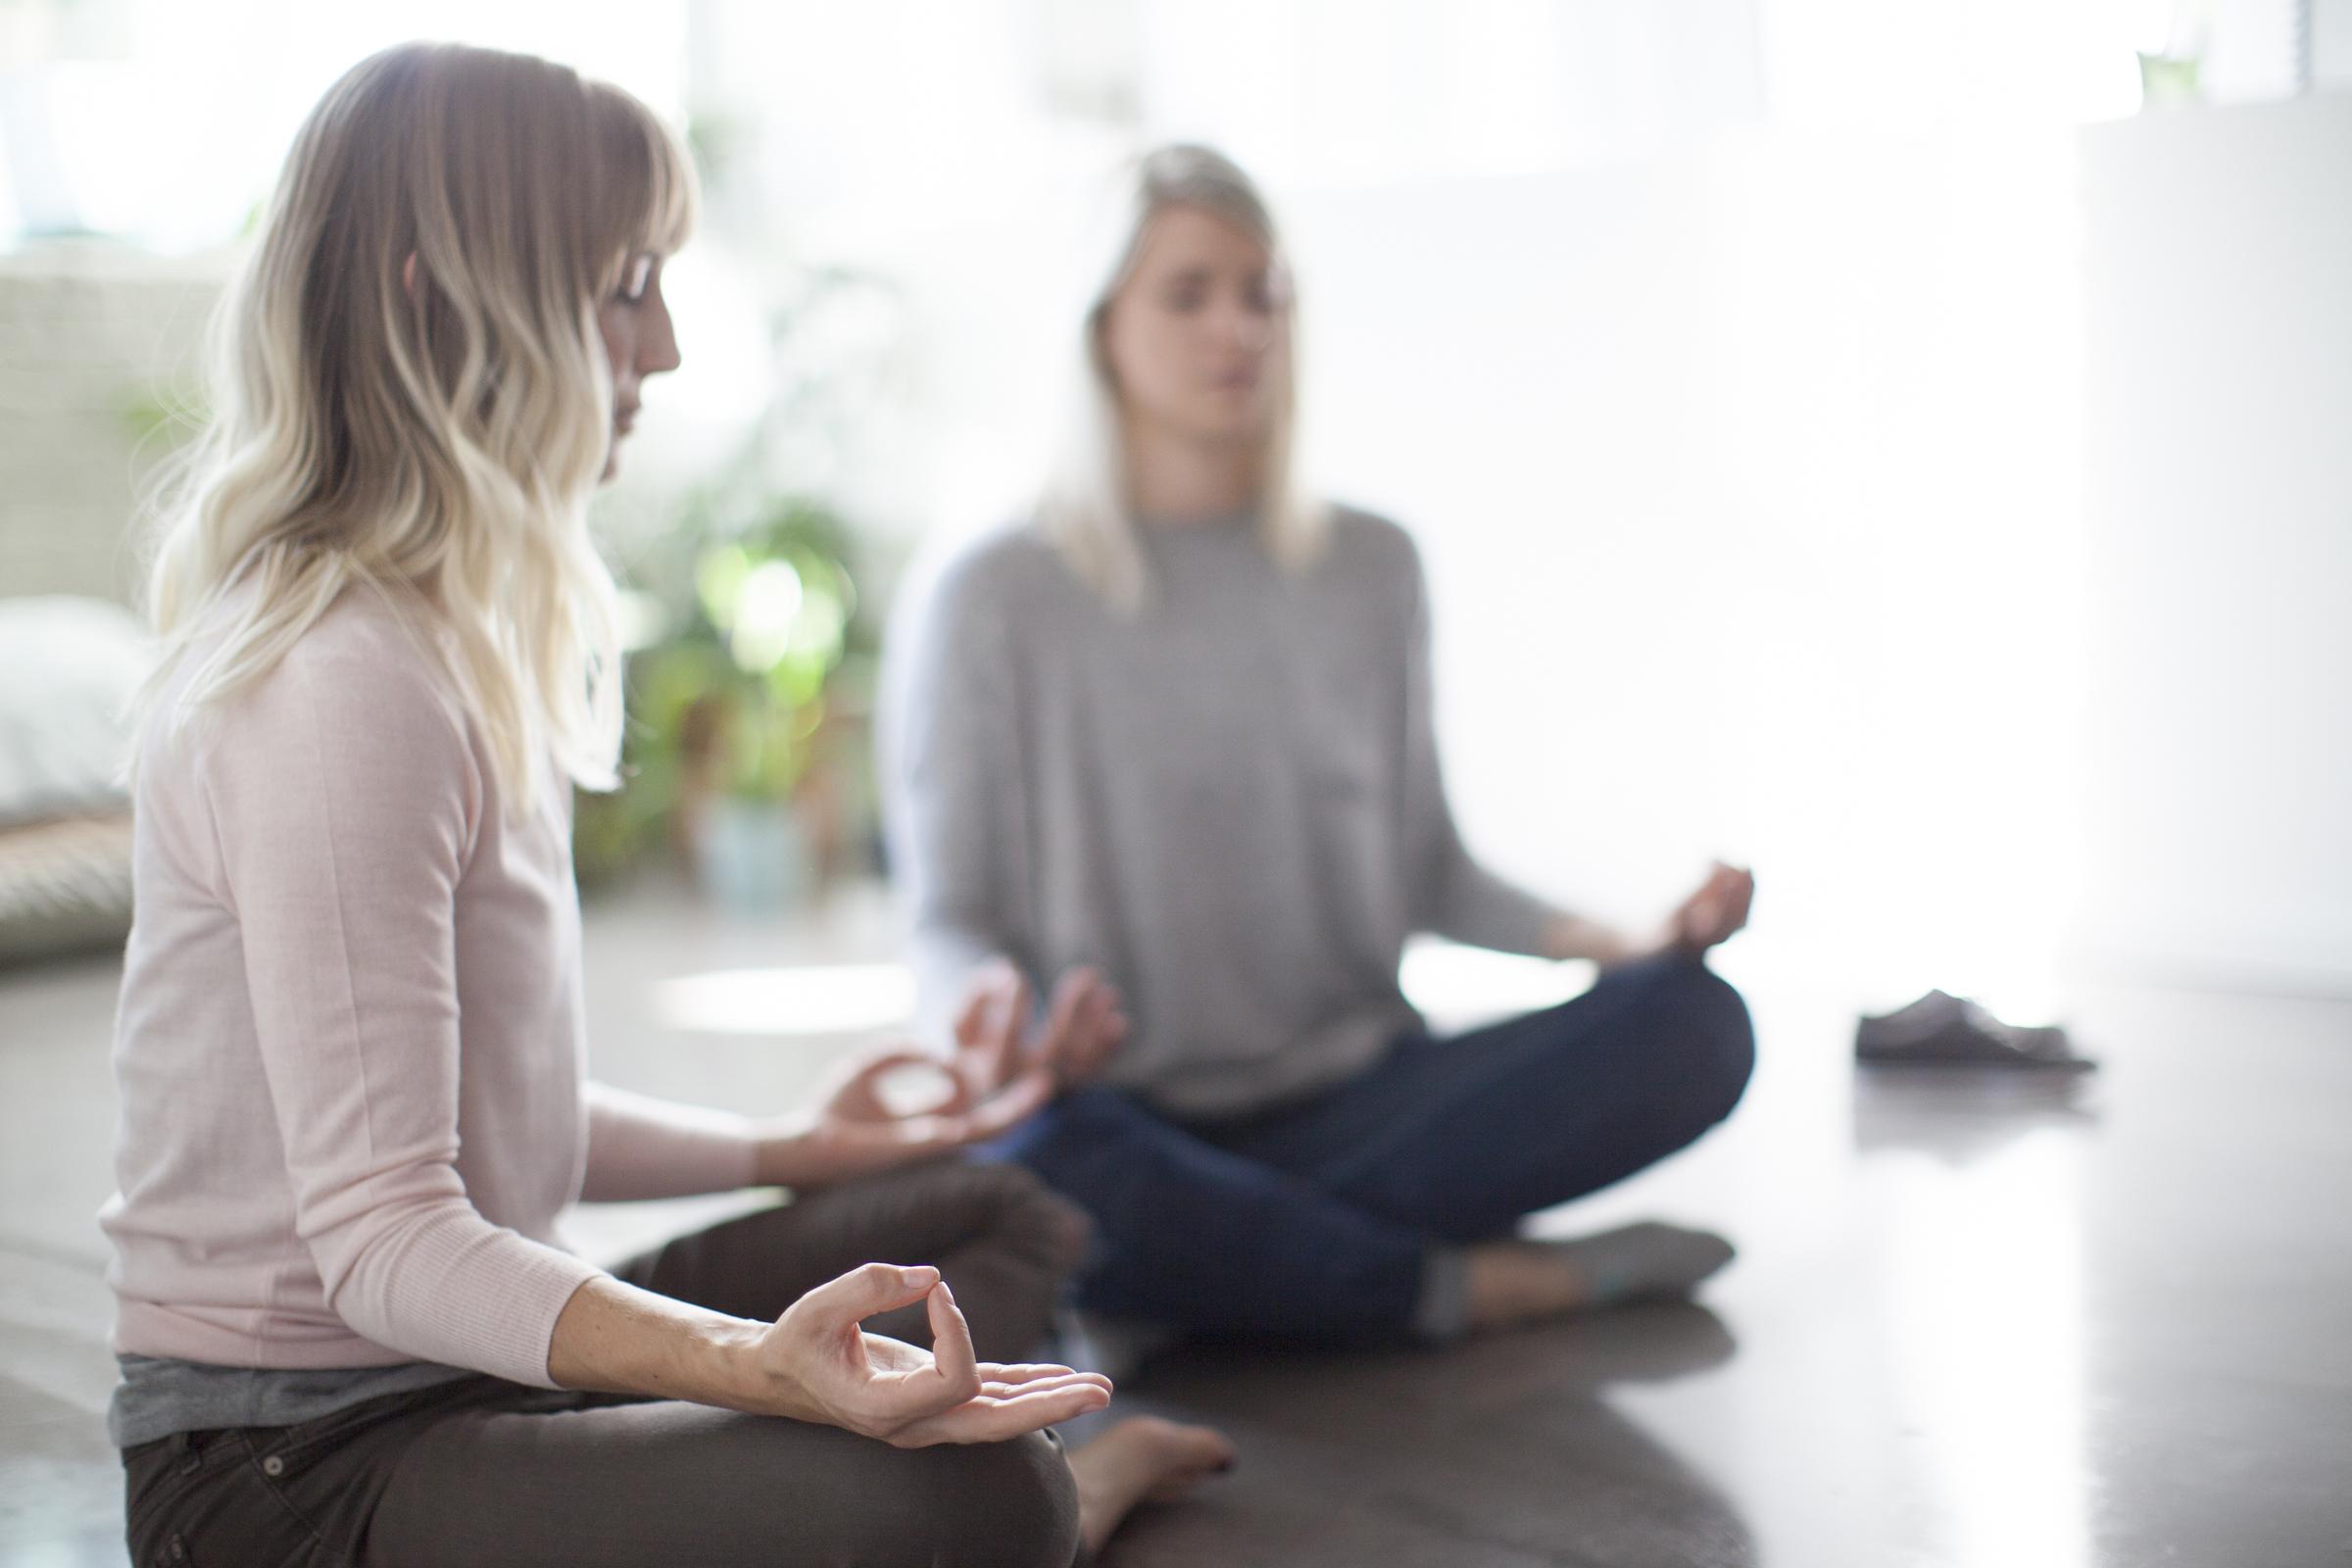 Meditation has been my mental, physical and spiritual saving grace.